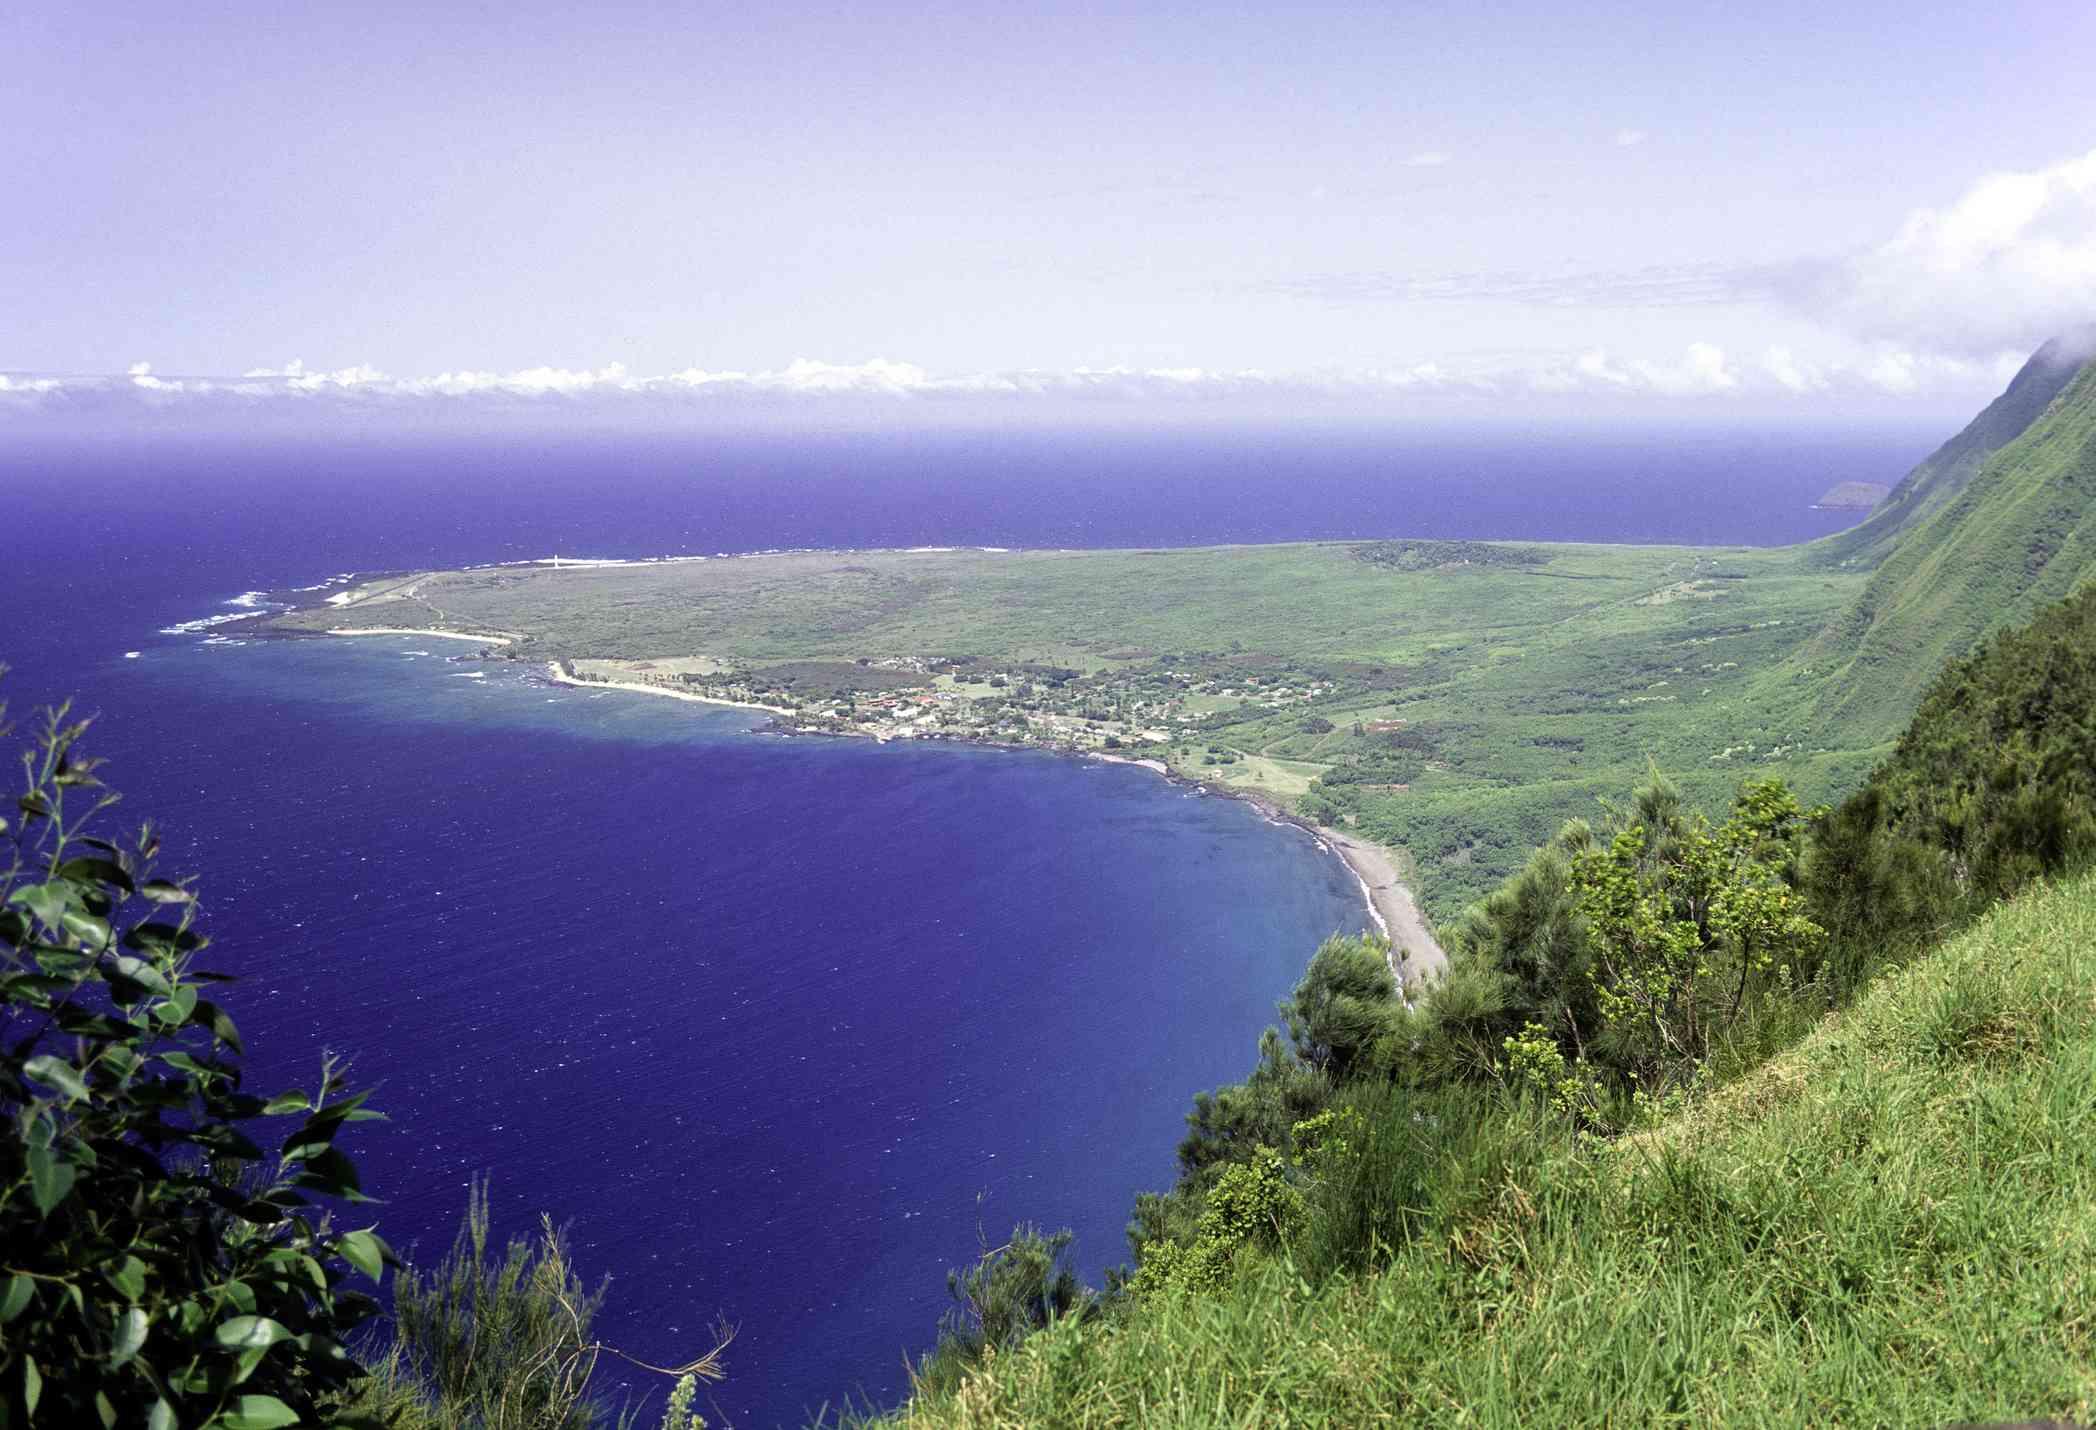 Kalaupapa Peninsula on Molokai